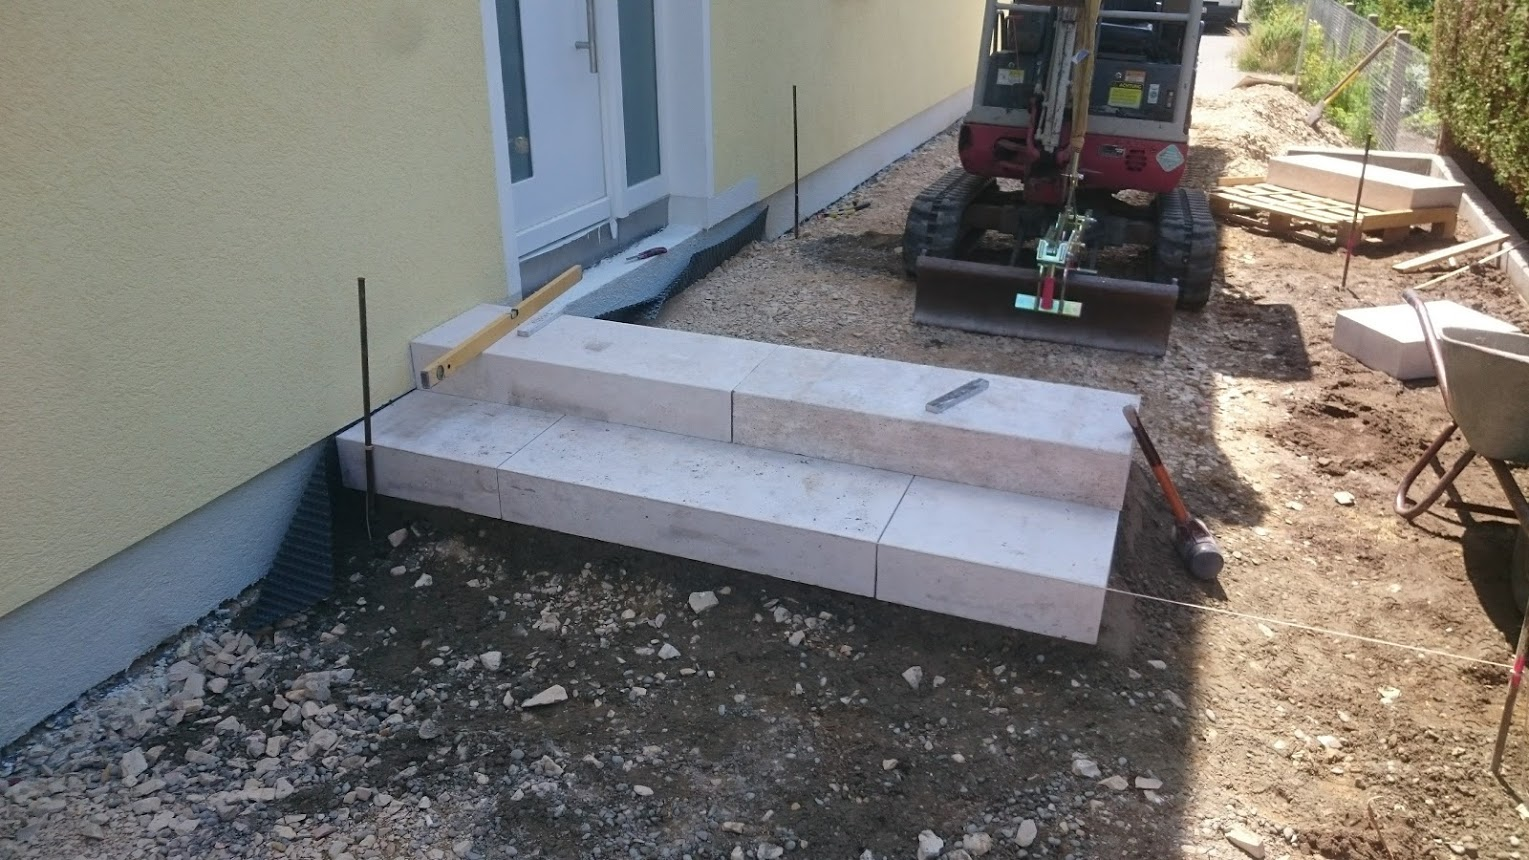 Landhaus Haust R emejing treppe vor haustür ideas kosherelsalvador com kosherelsalvador com